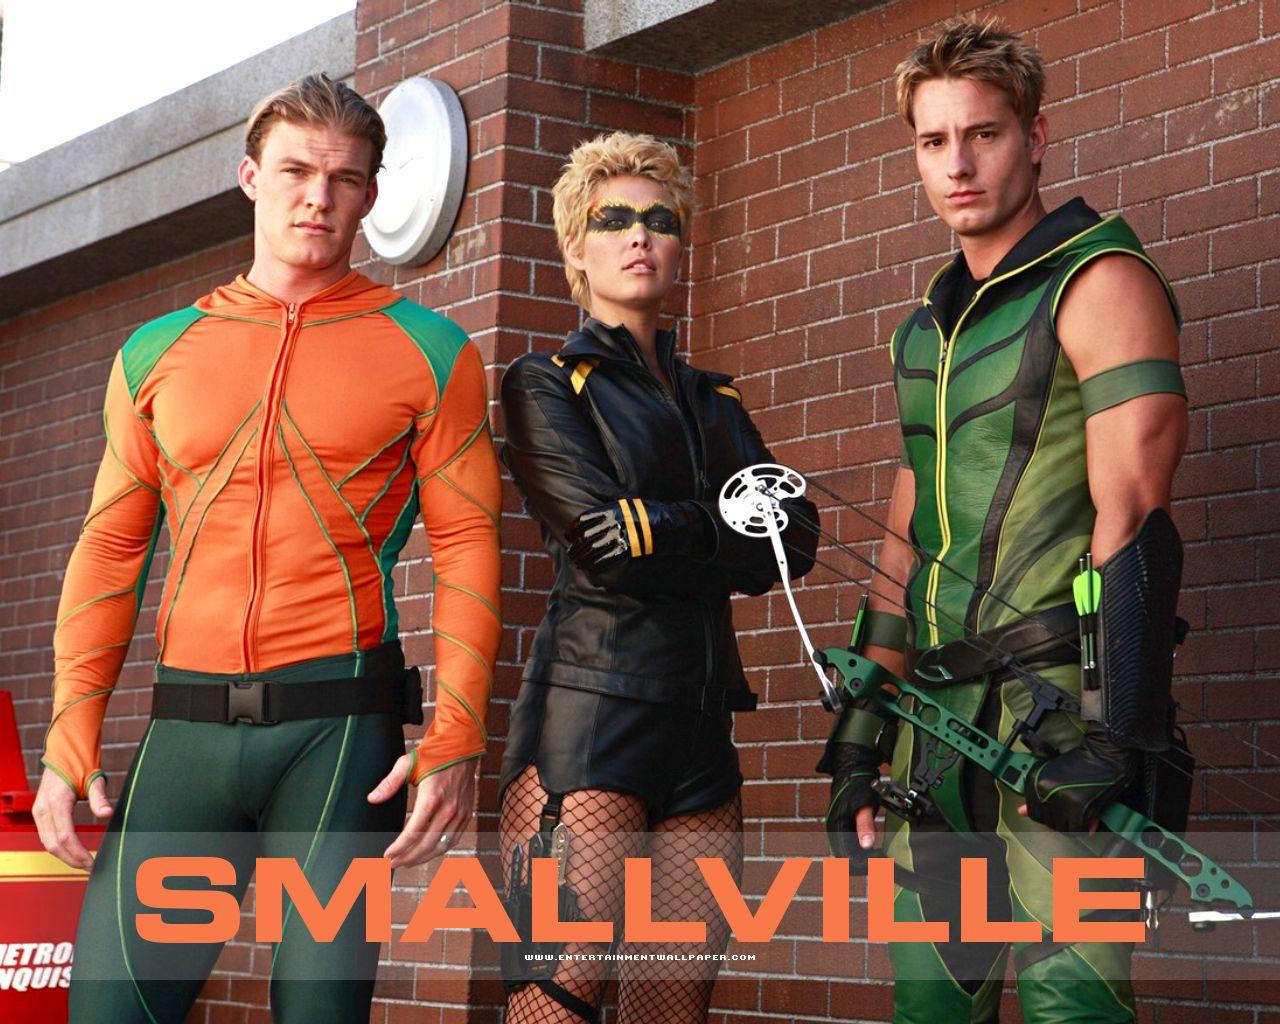 Hd Wallpapers Assassins Creed Fondos De Smallville Wallpapers